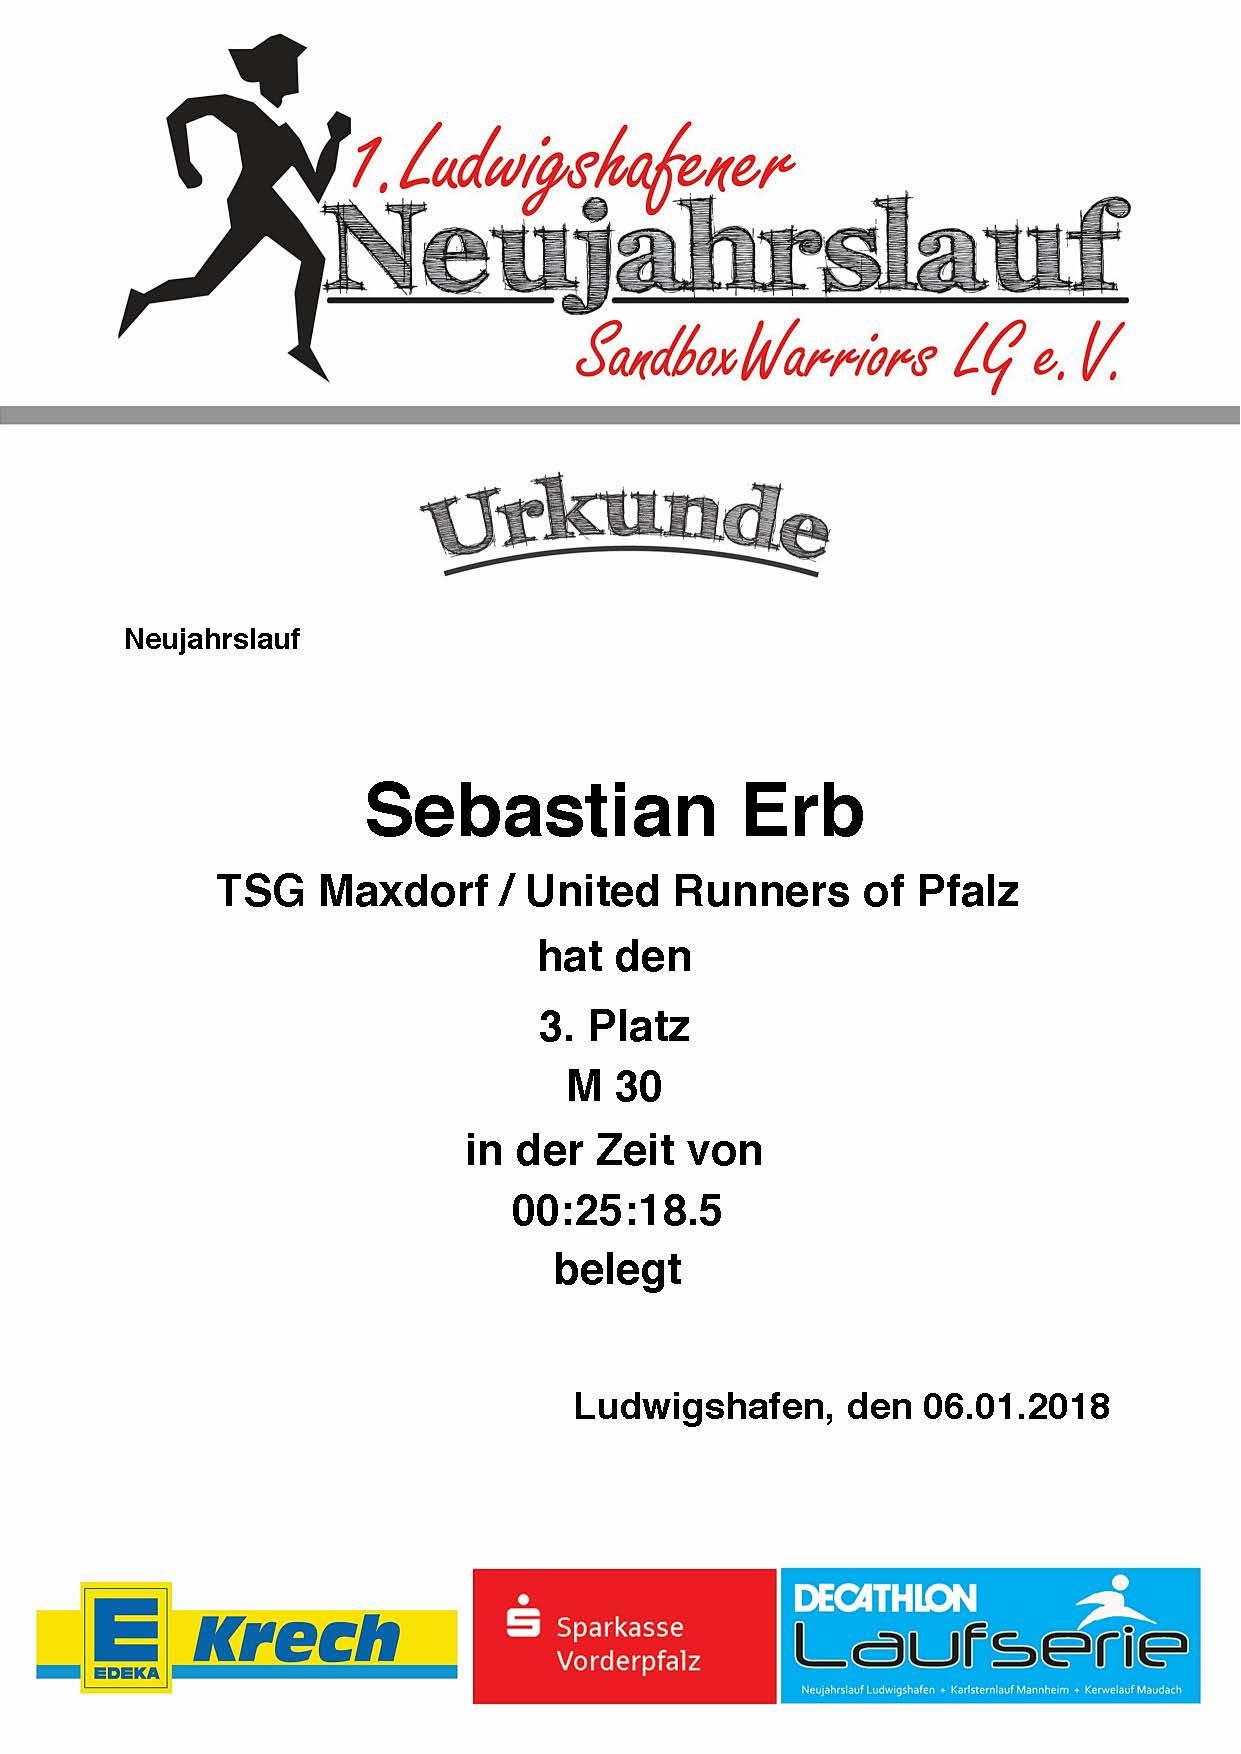 Urkunde 1. Neujahrslauf Ludwigshafen 2018